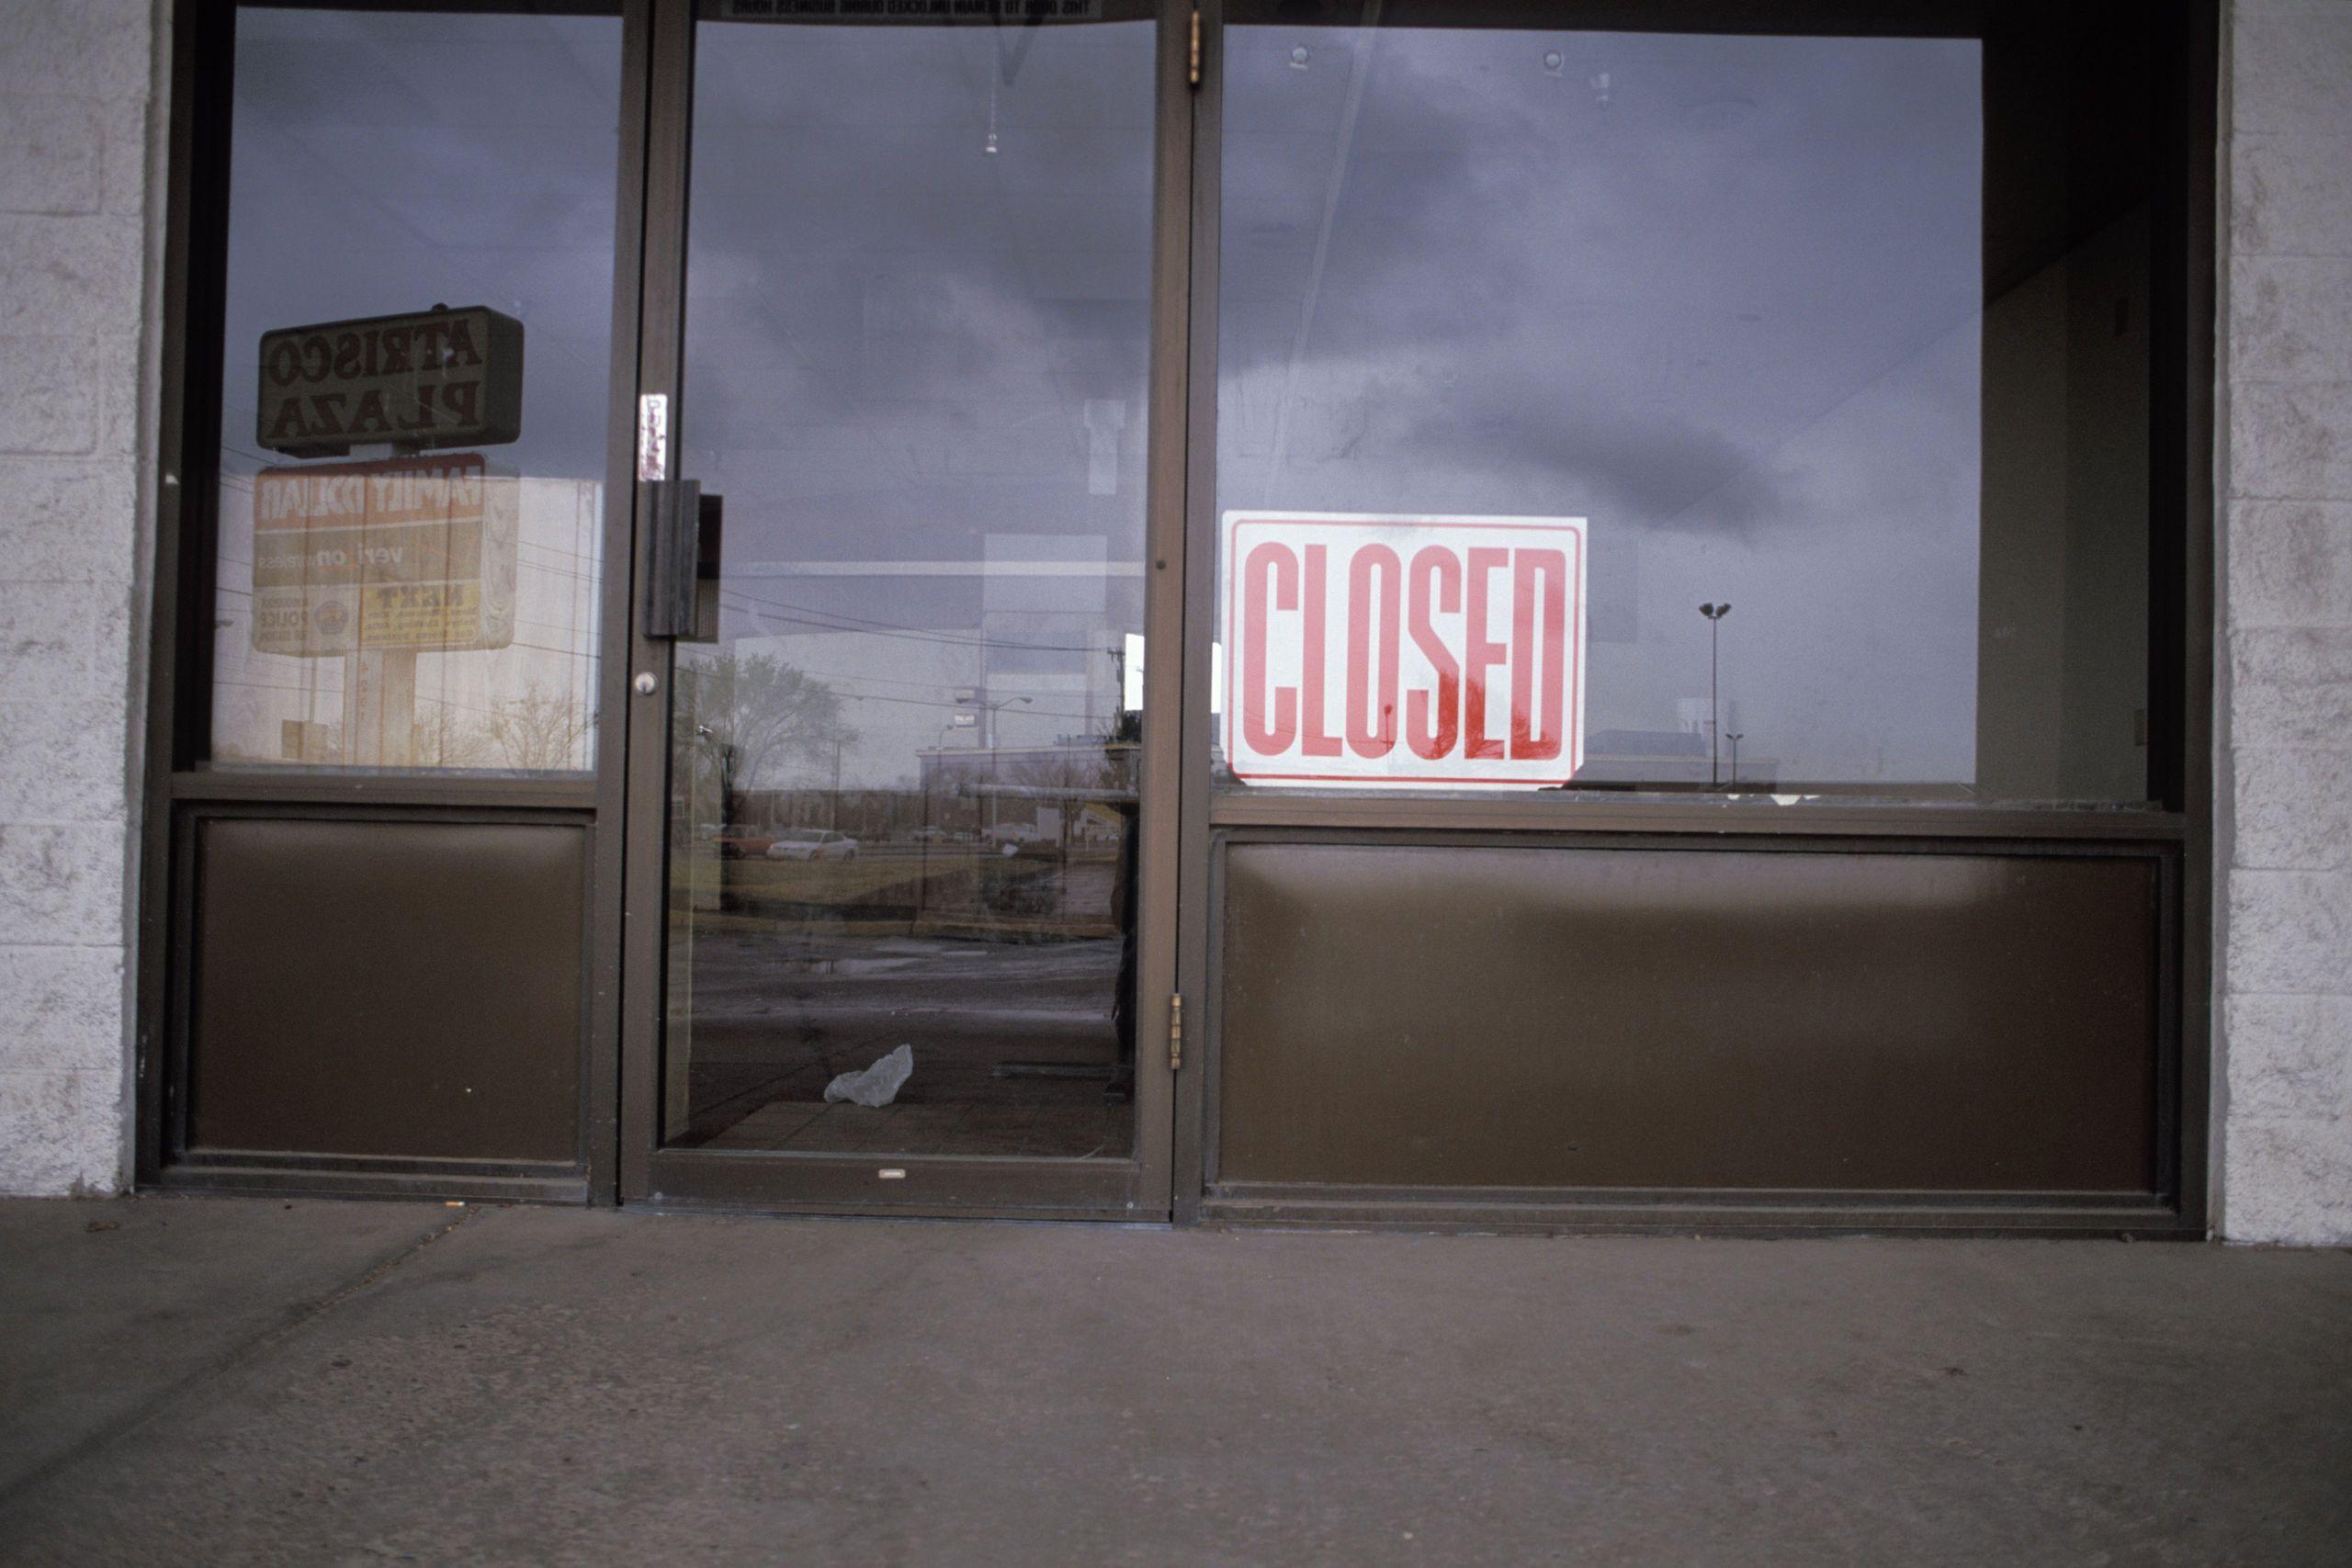 store-closed-image